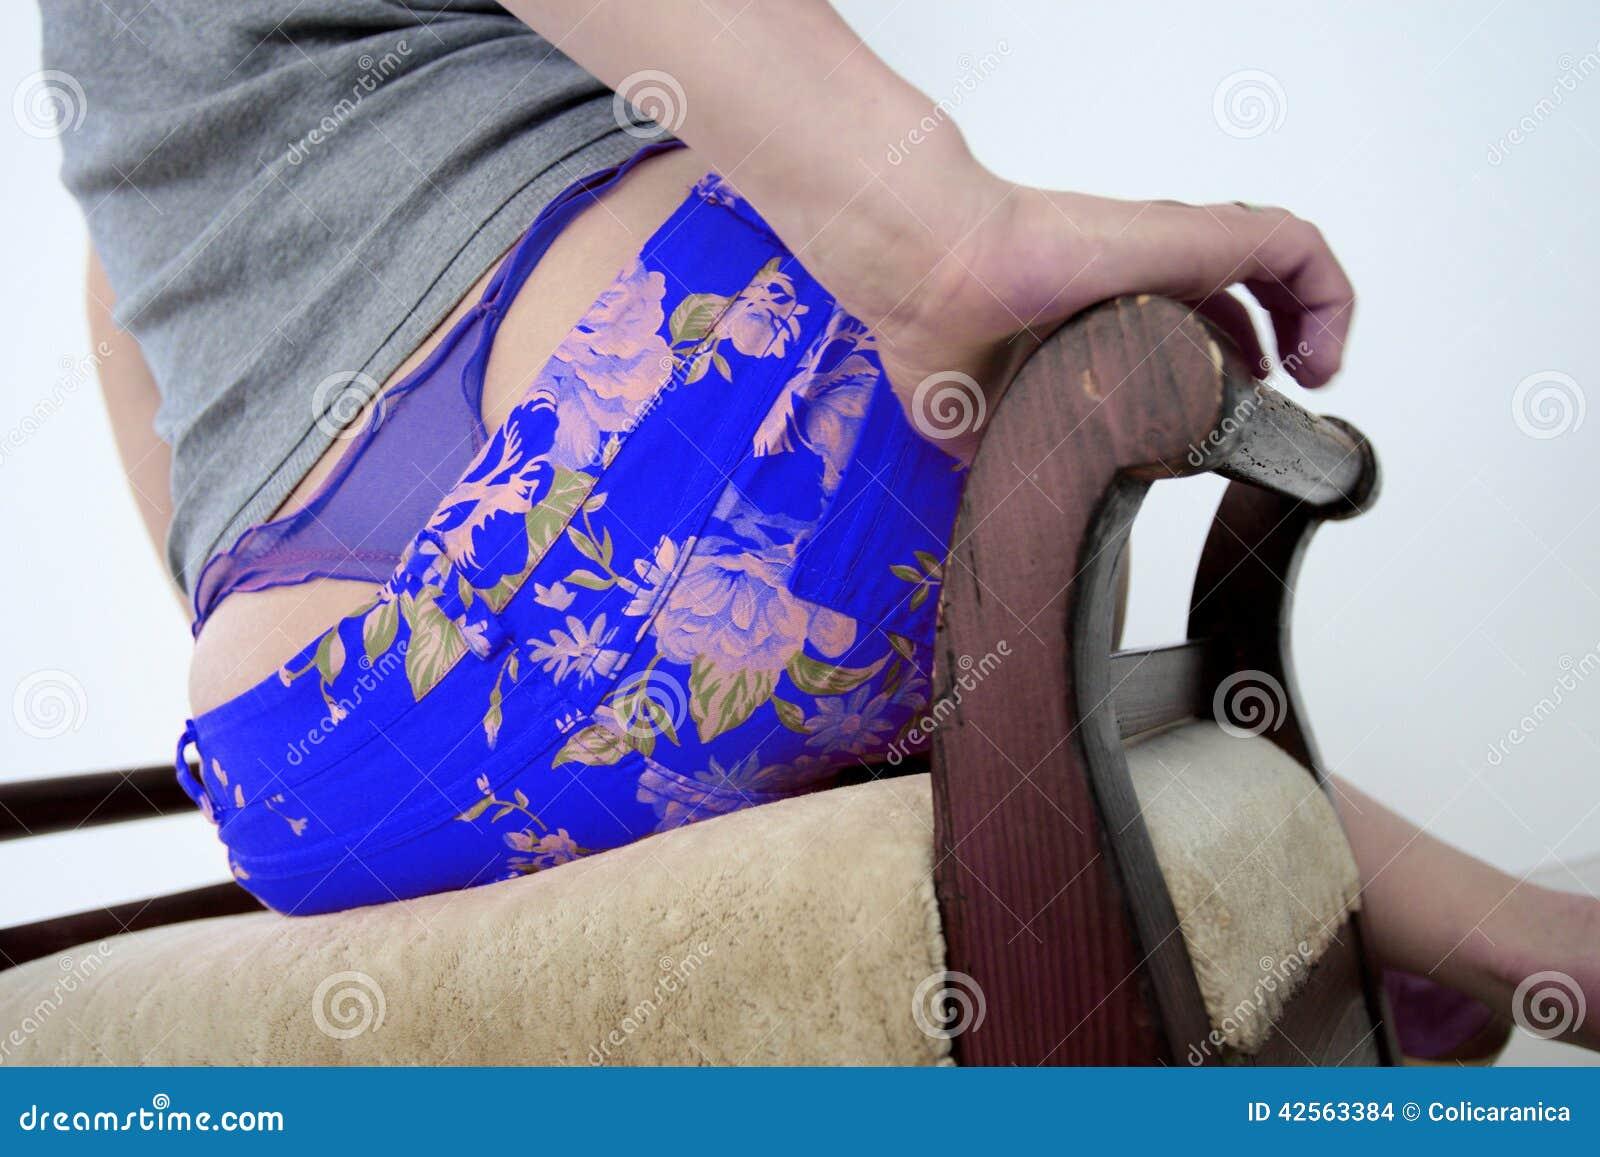 Blue Panties Stock Photo Image Of Woman, Girl, Cloth - 42563384-4176